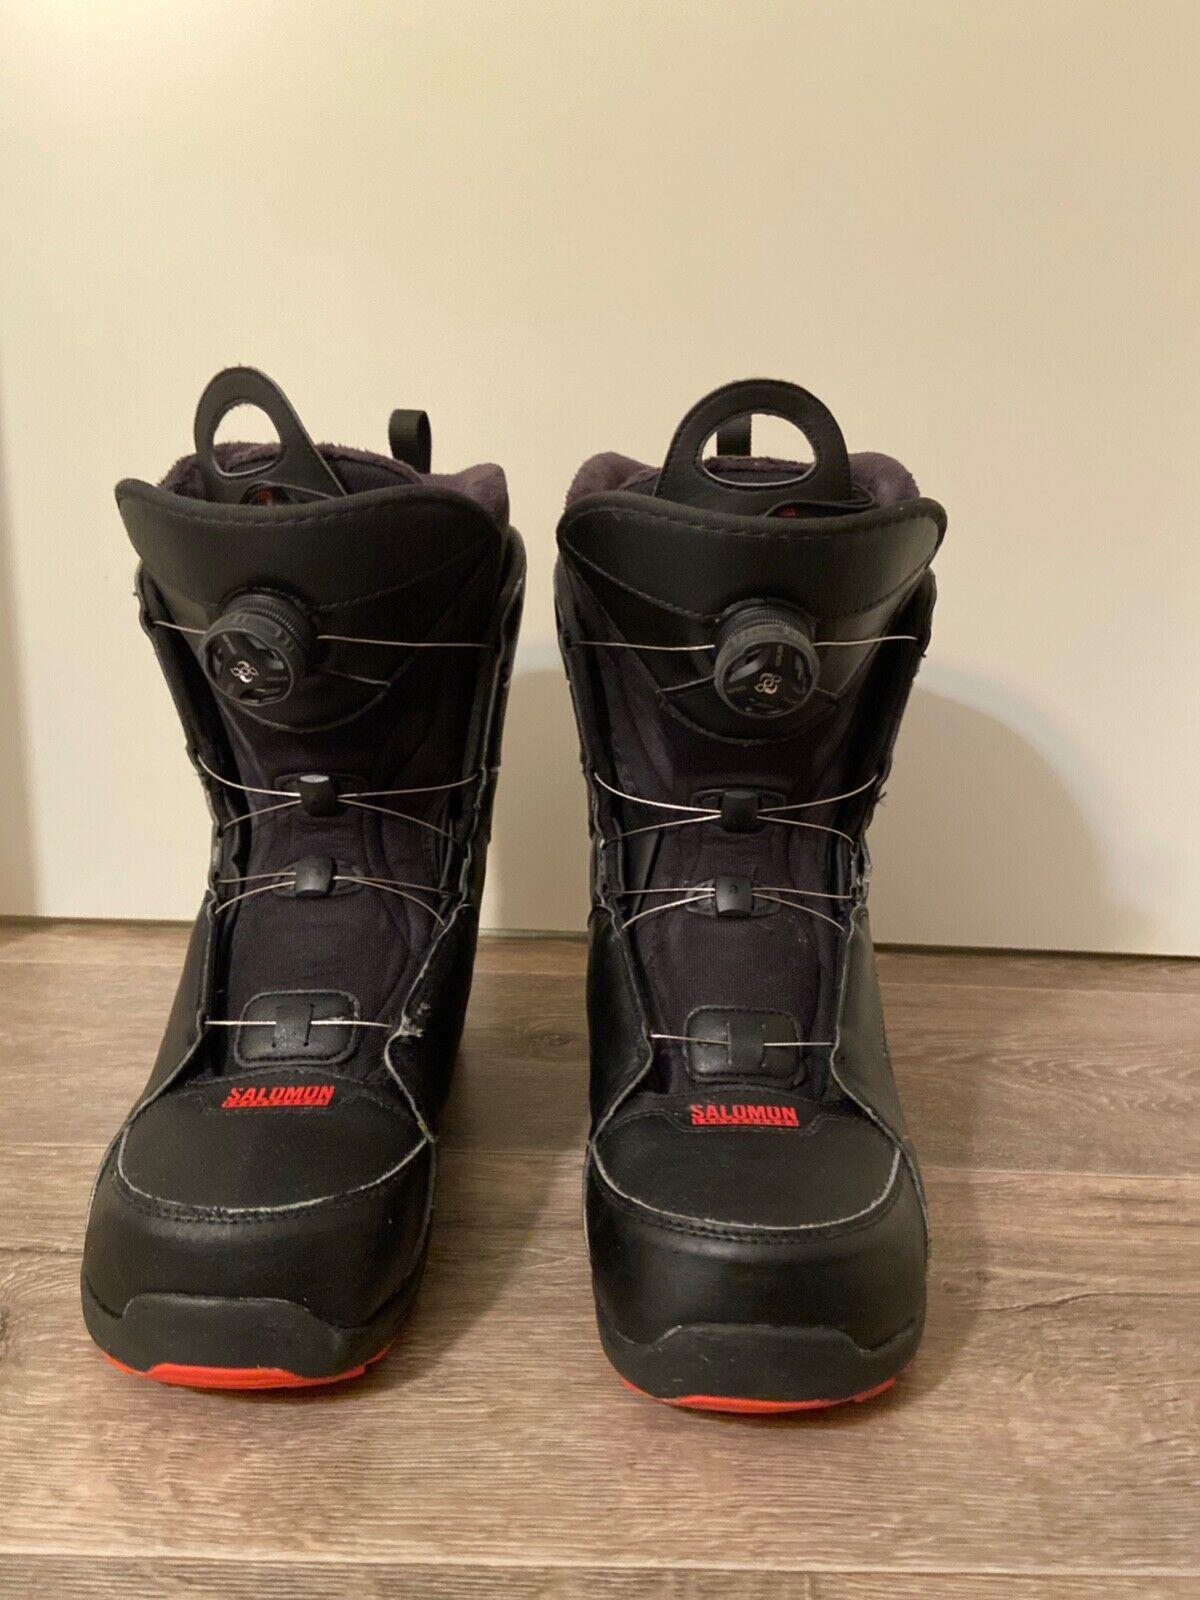 Snowboardschuhe Herren, Salomon Faction Boa, schwarz , Größe 45